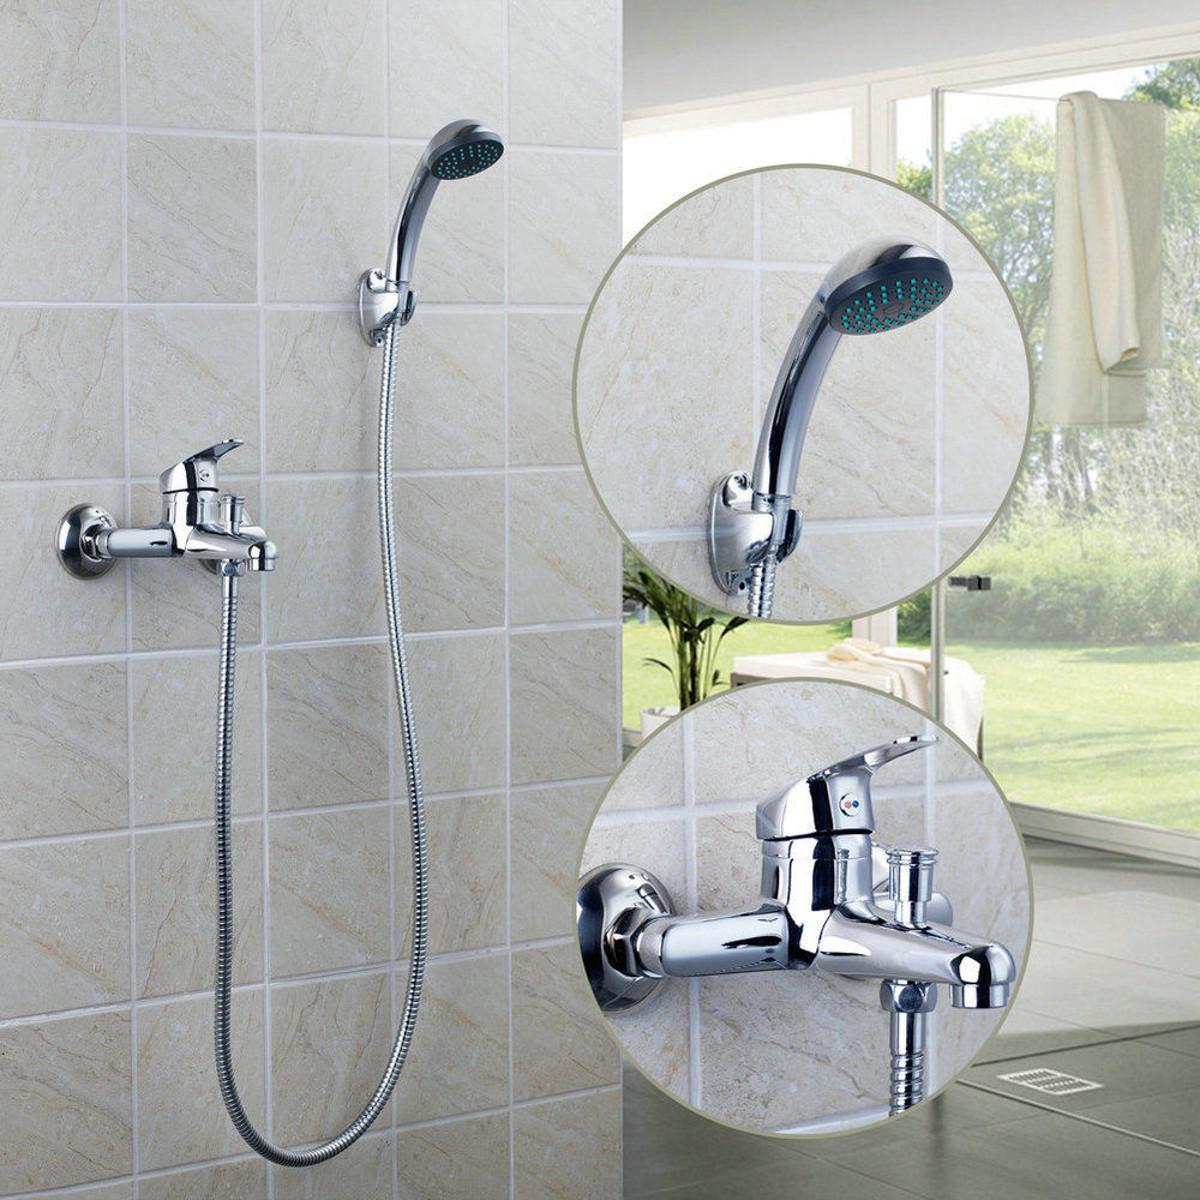 Chrome Wall Mounted Bathroom Bathtub Shower Faucet Set Mixer With Hand Sprayer